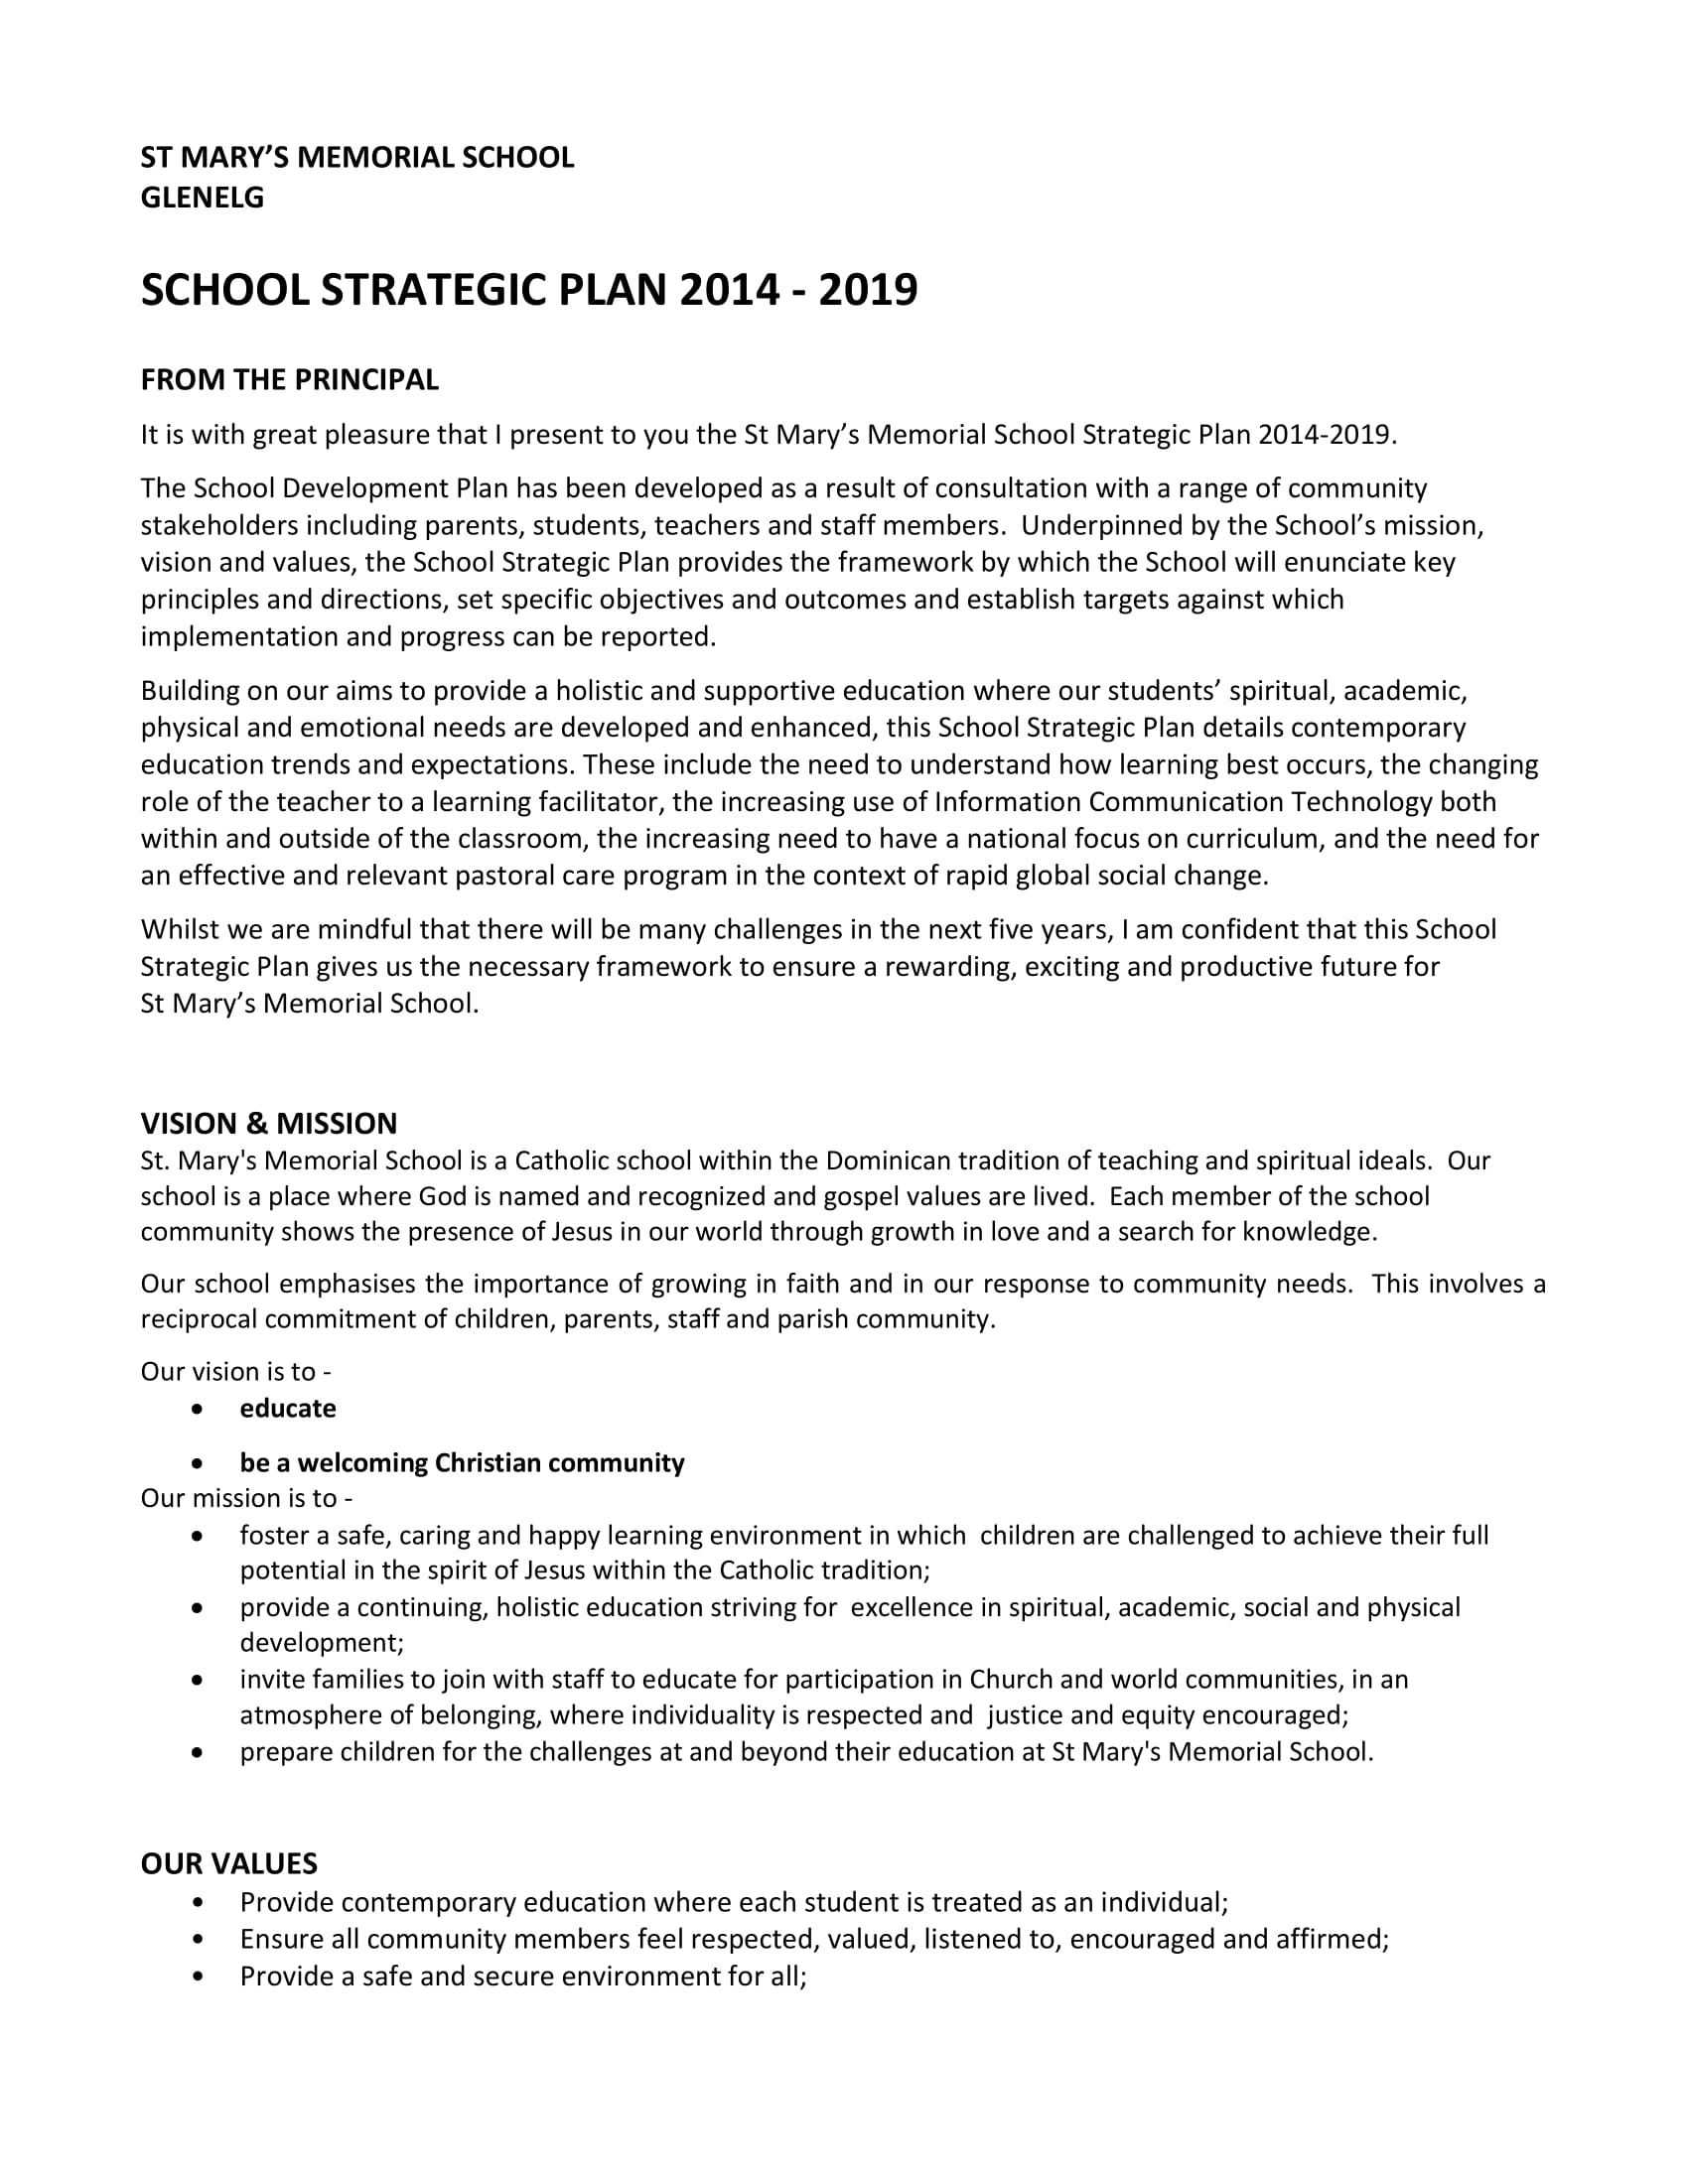 strategic plan samples